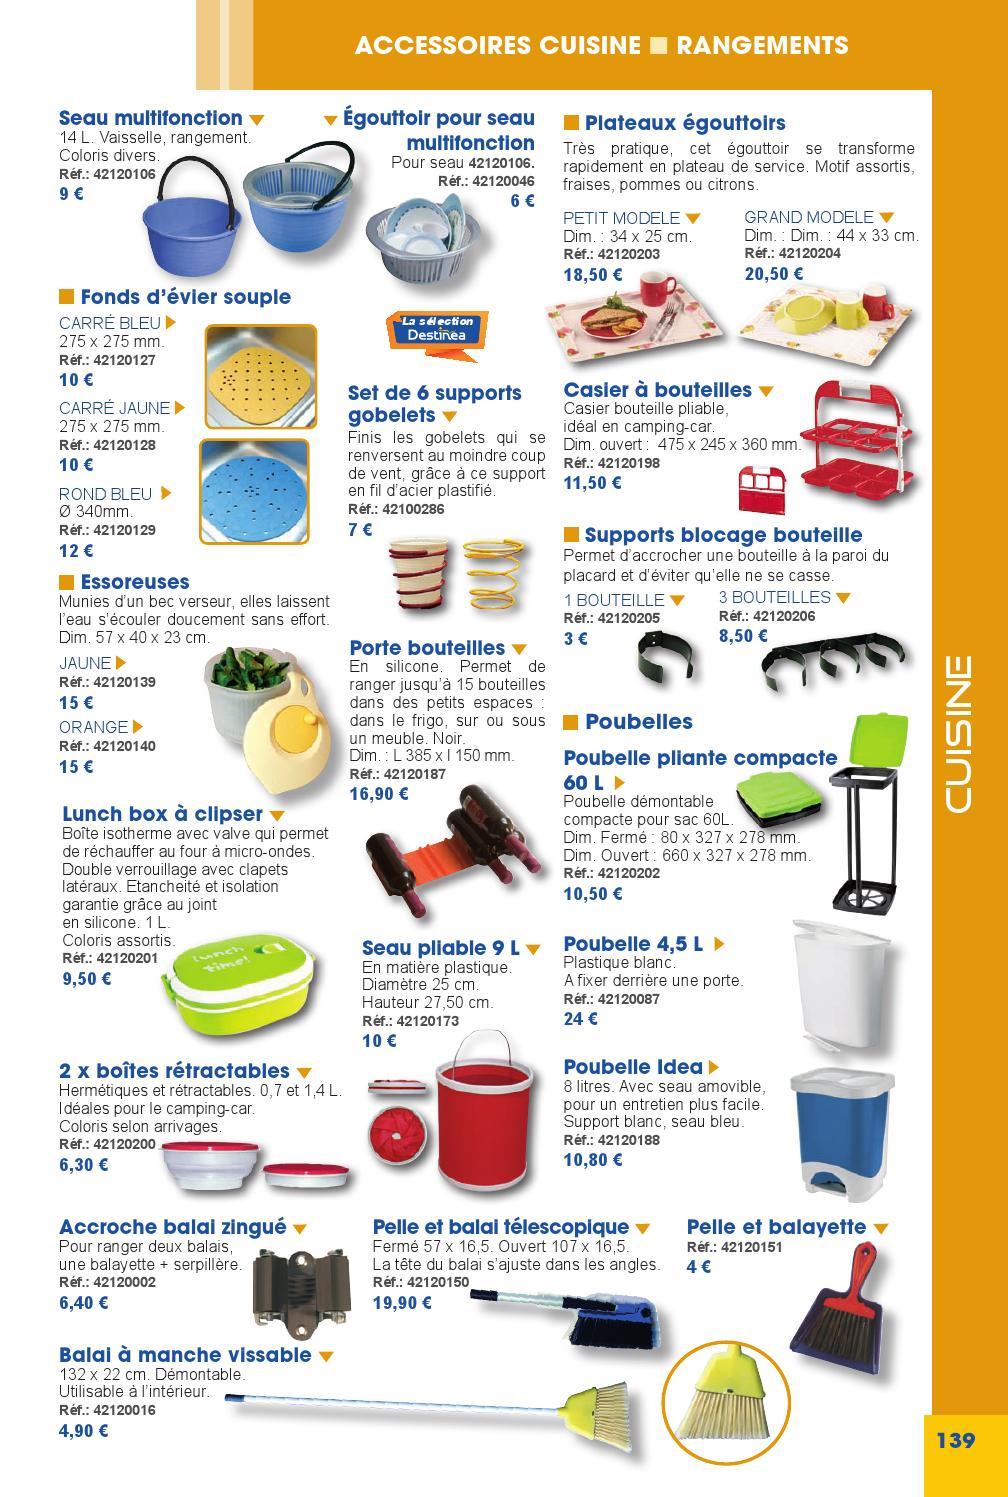 6 catalogue destin a 2014 cuisine by destin a accessoires for Catalogue accessoires cuisine